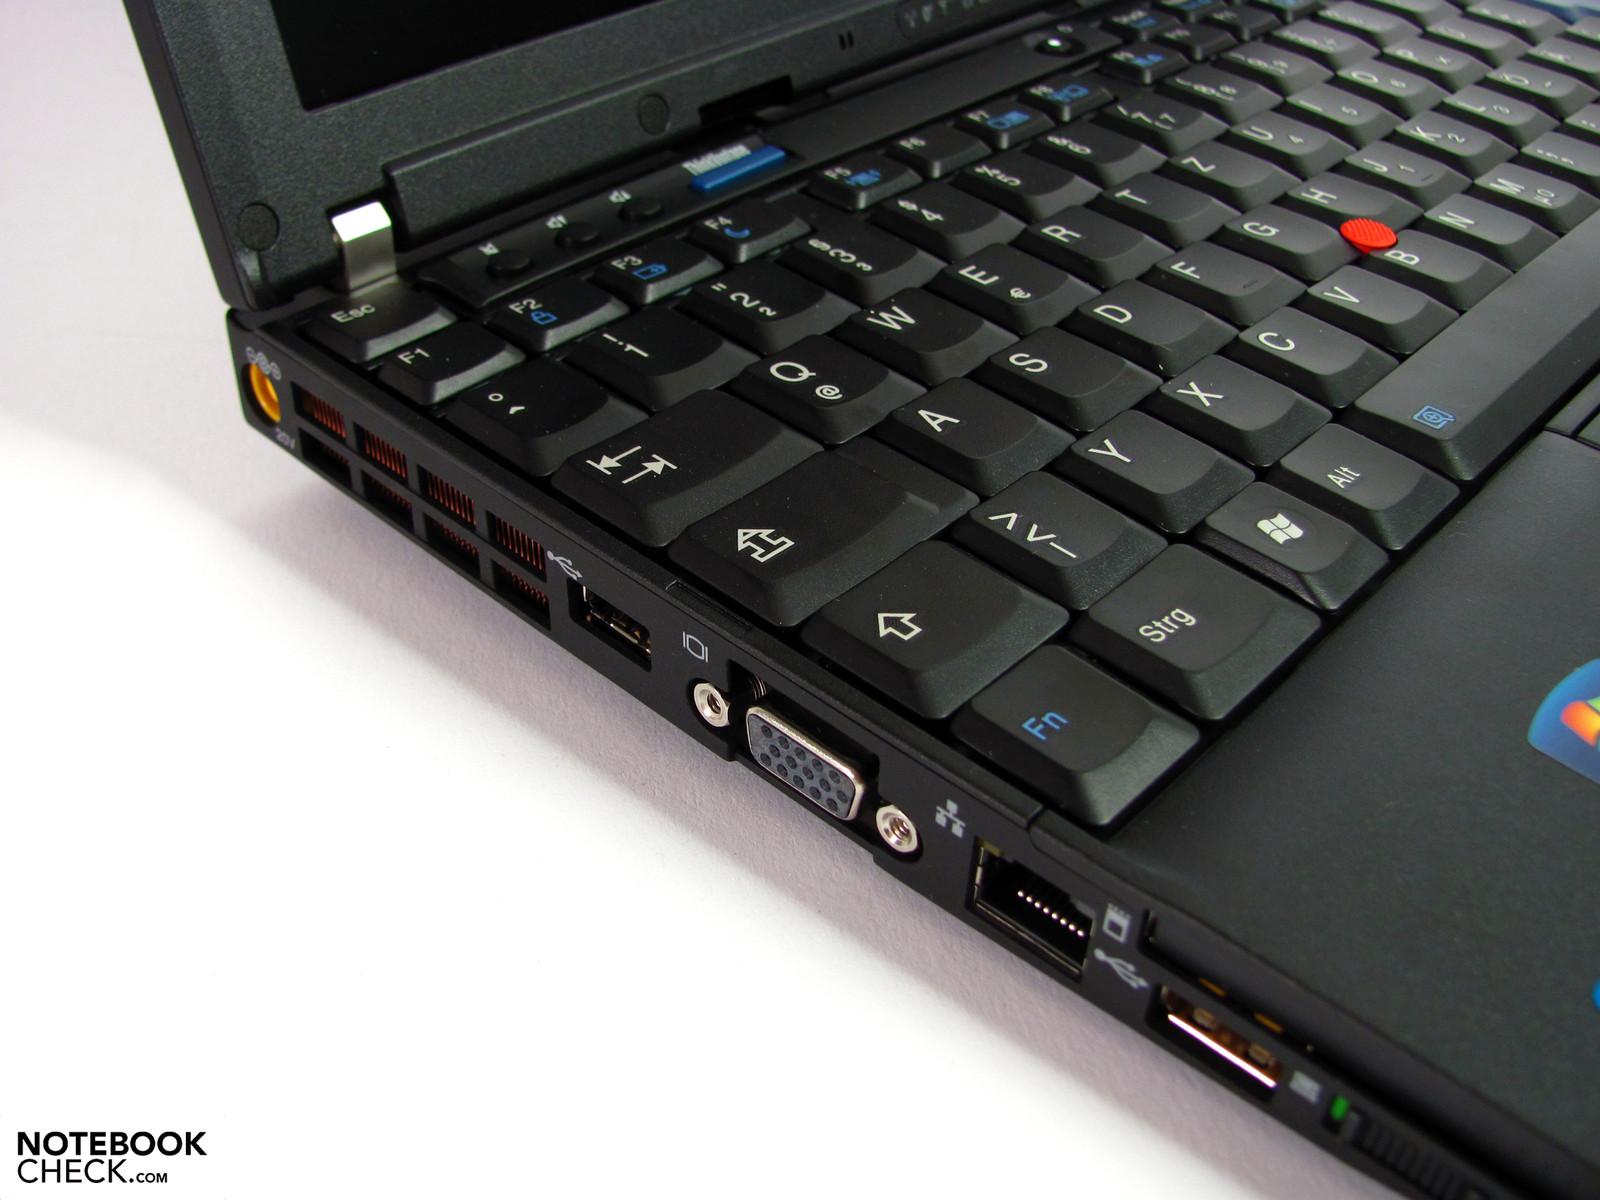 analisis del portatil lenovo thinkpad  notebookcheckorg